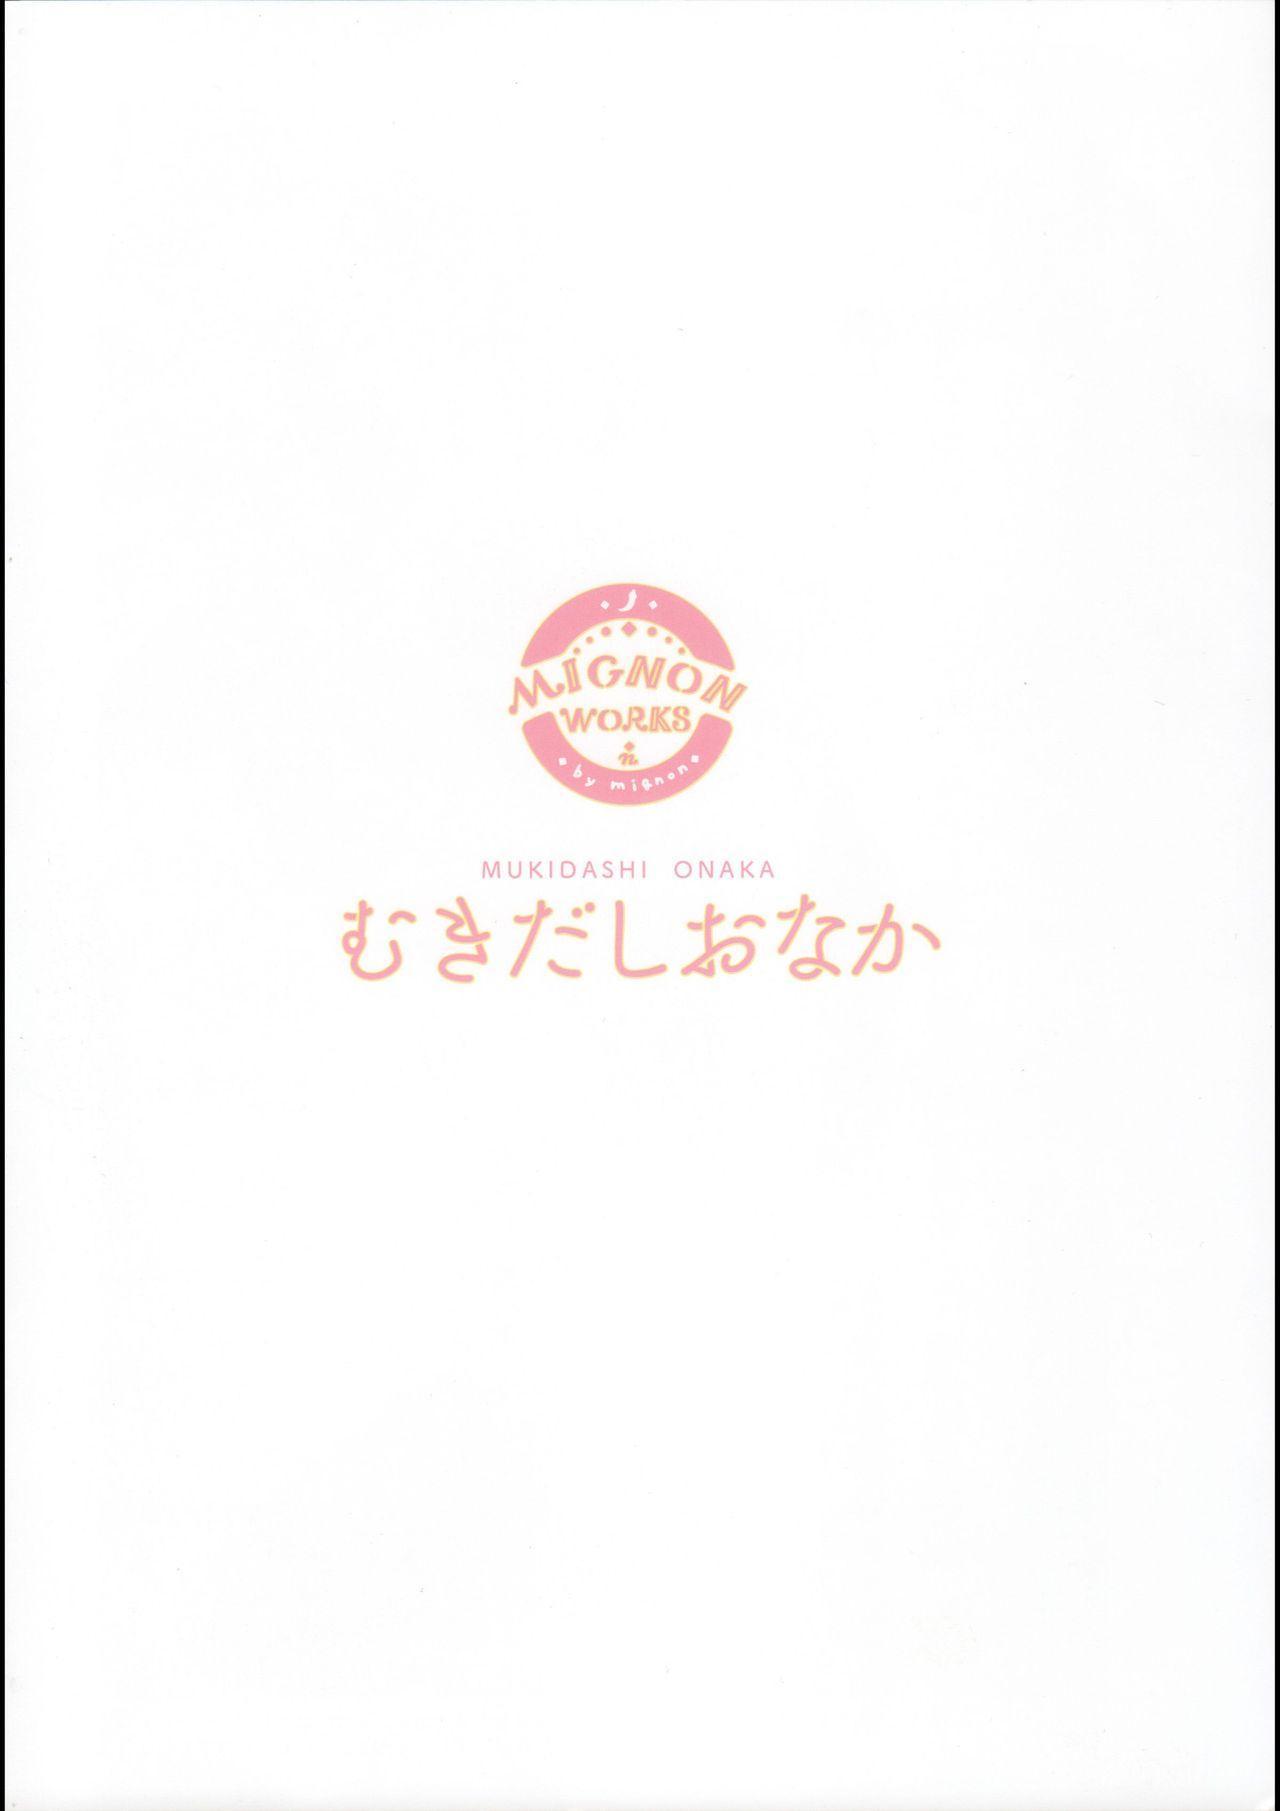 Mukidashi Onaka 1